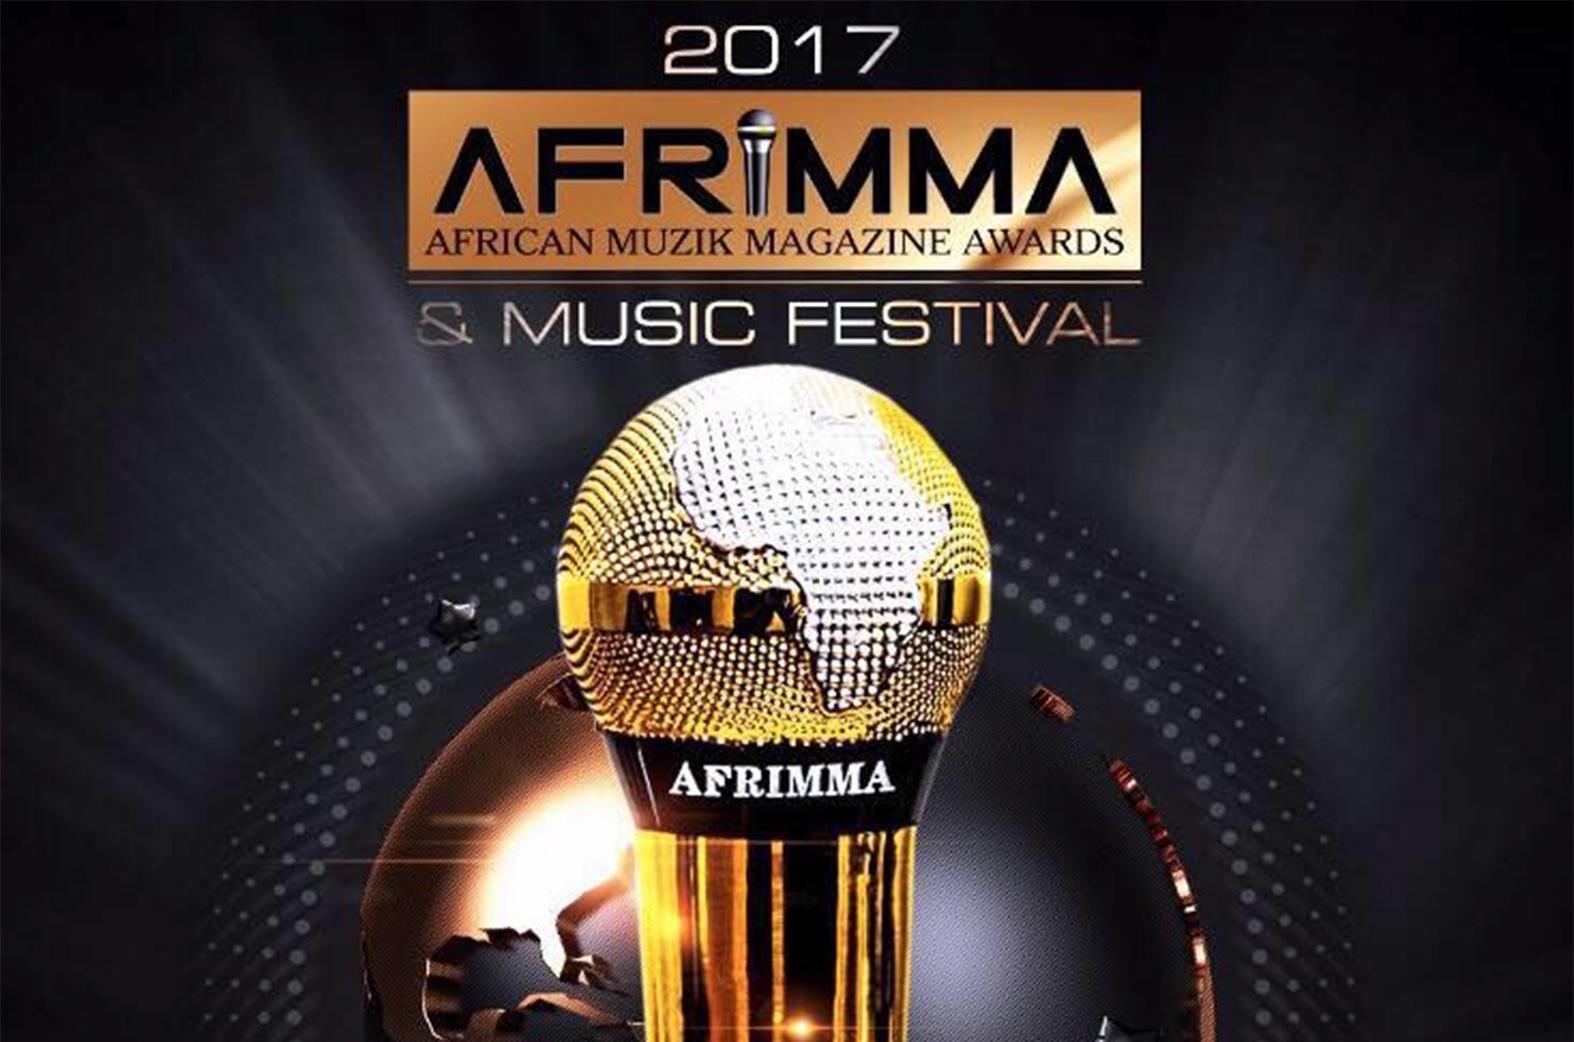 AFRIMMA 2017